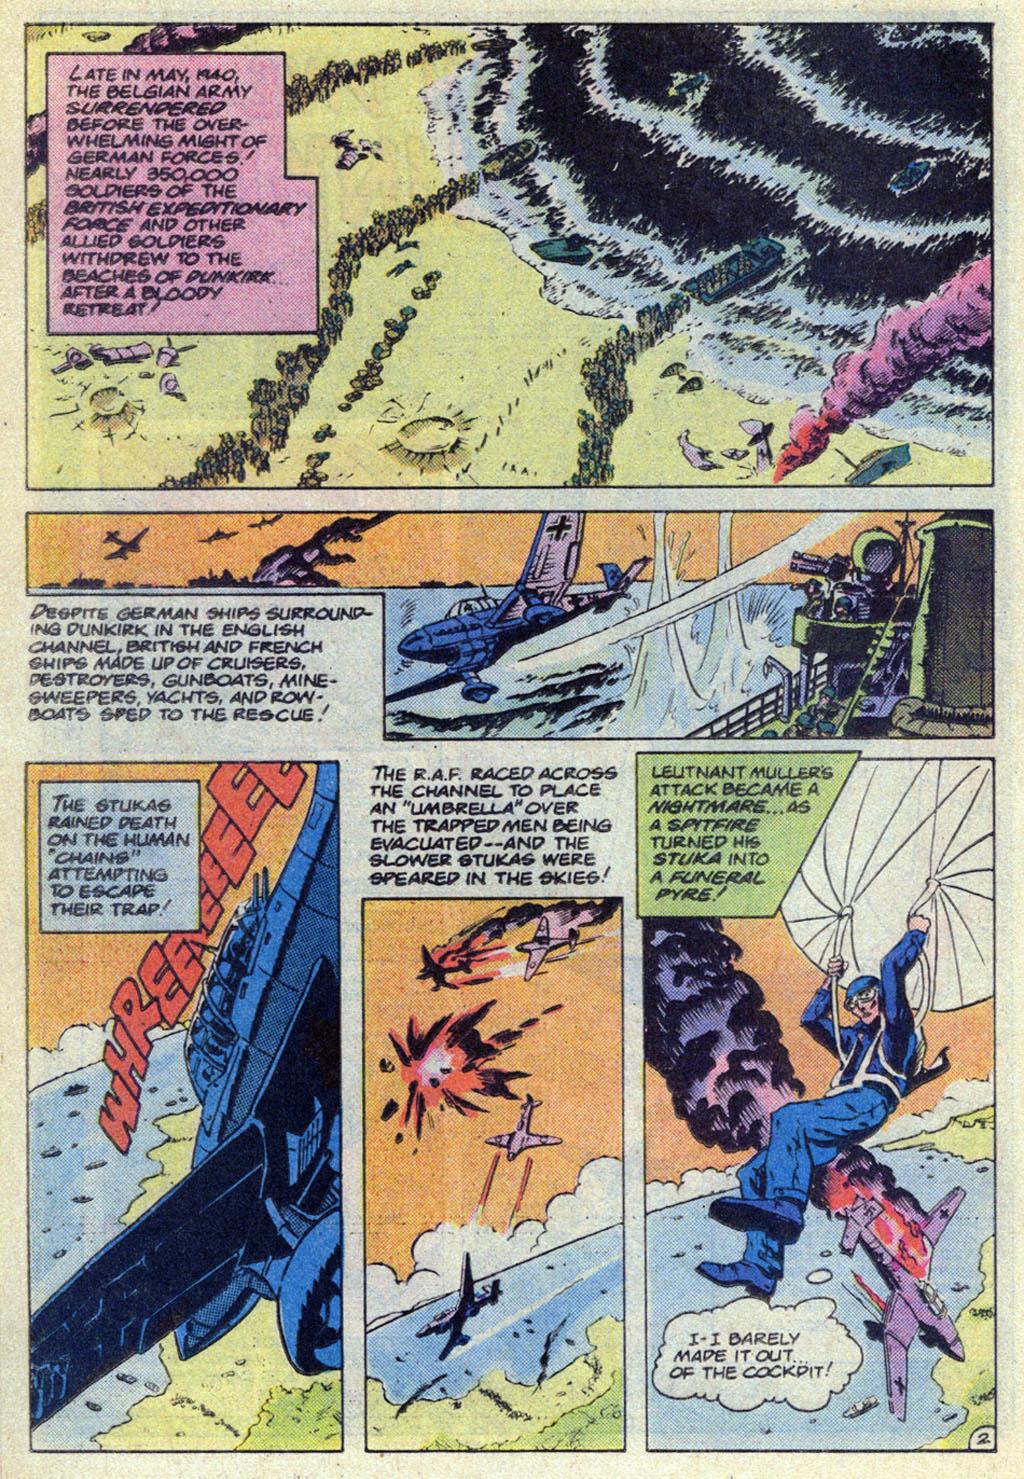 Read online Sgt. Rock comic -  Issue #369 - 15